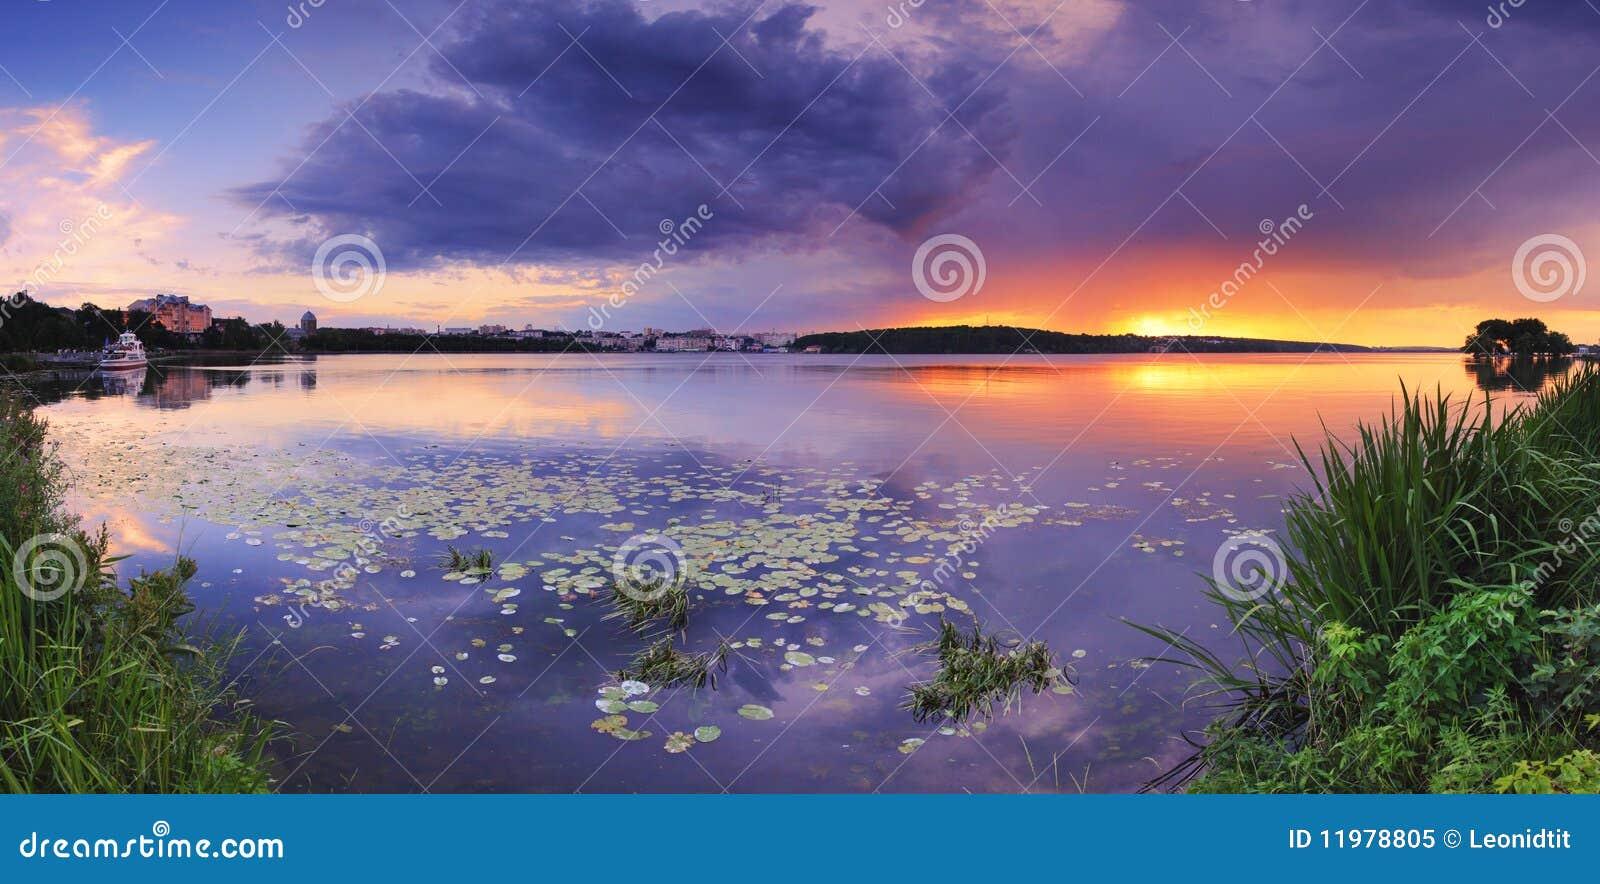 Evening in lake